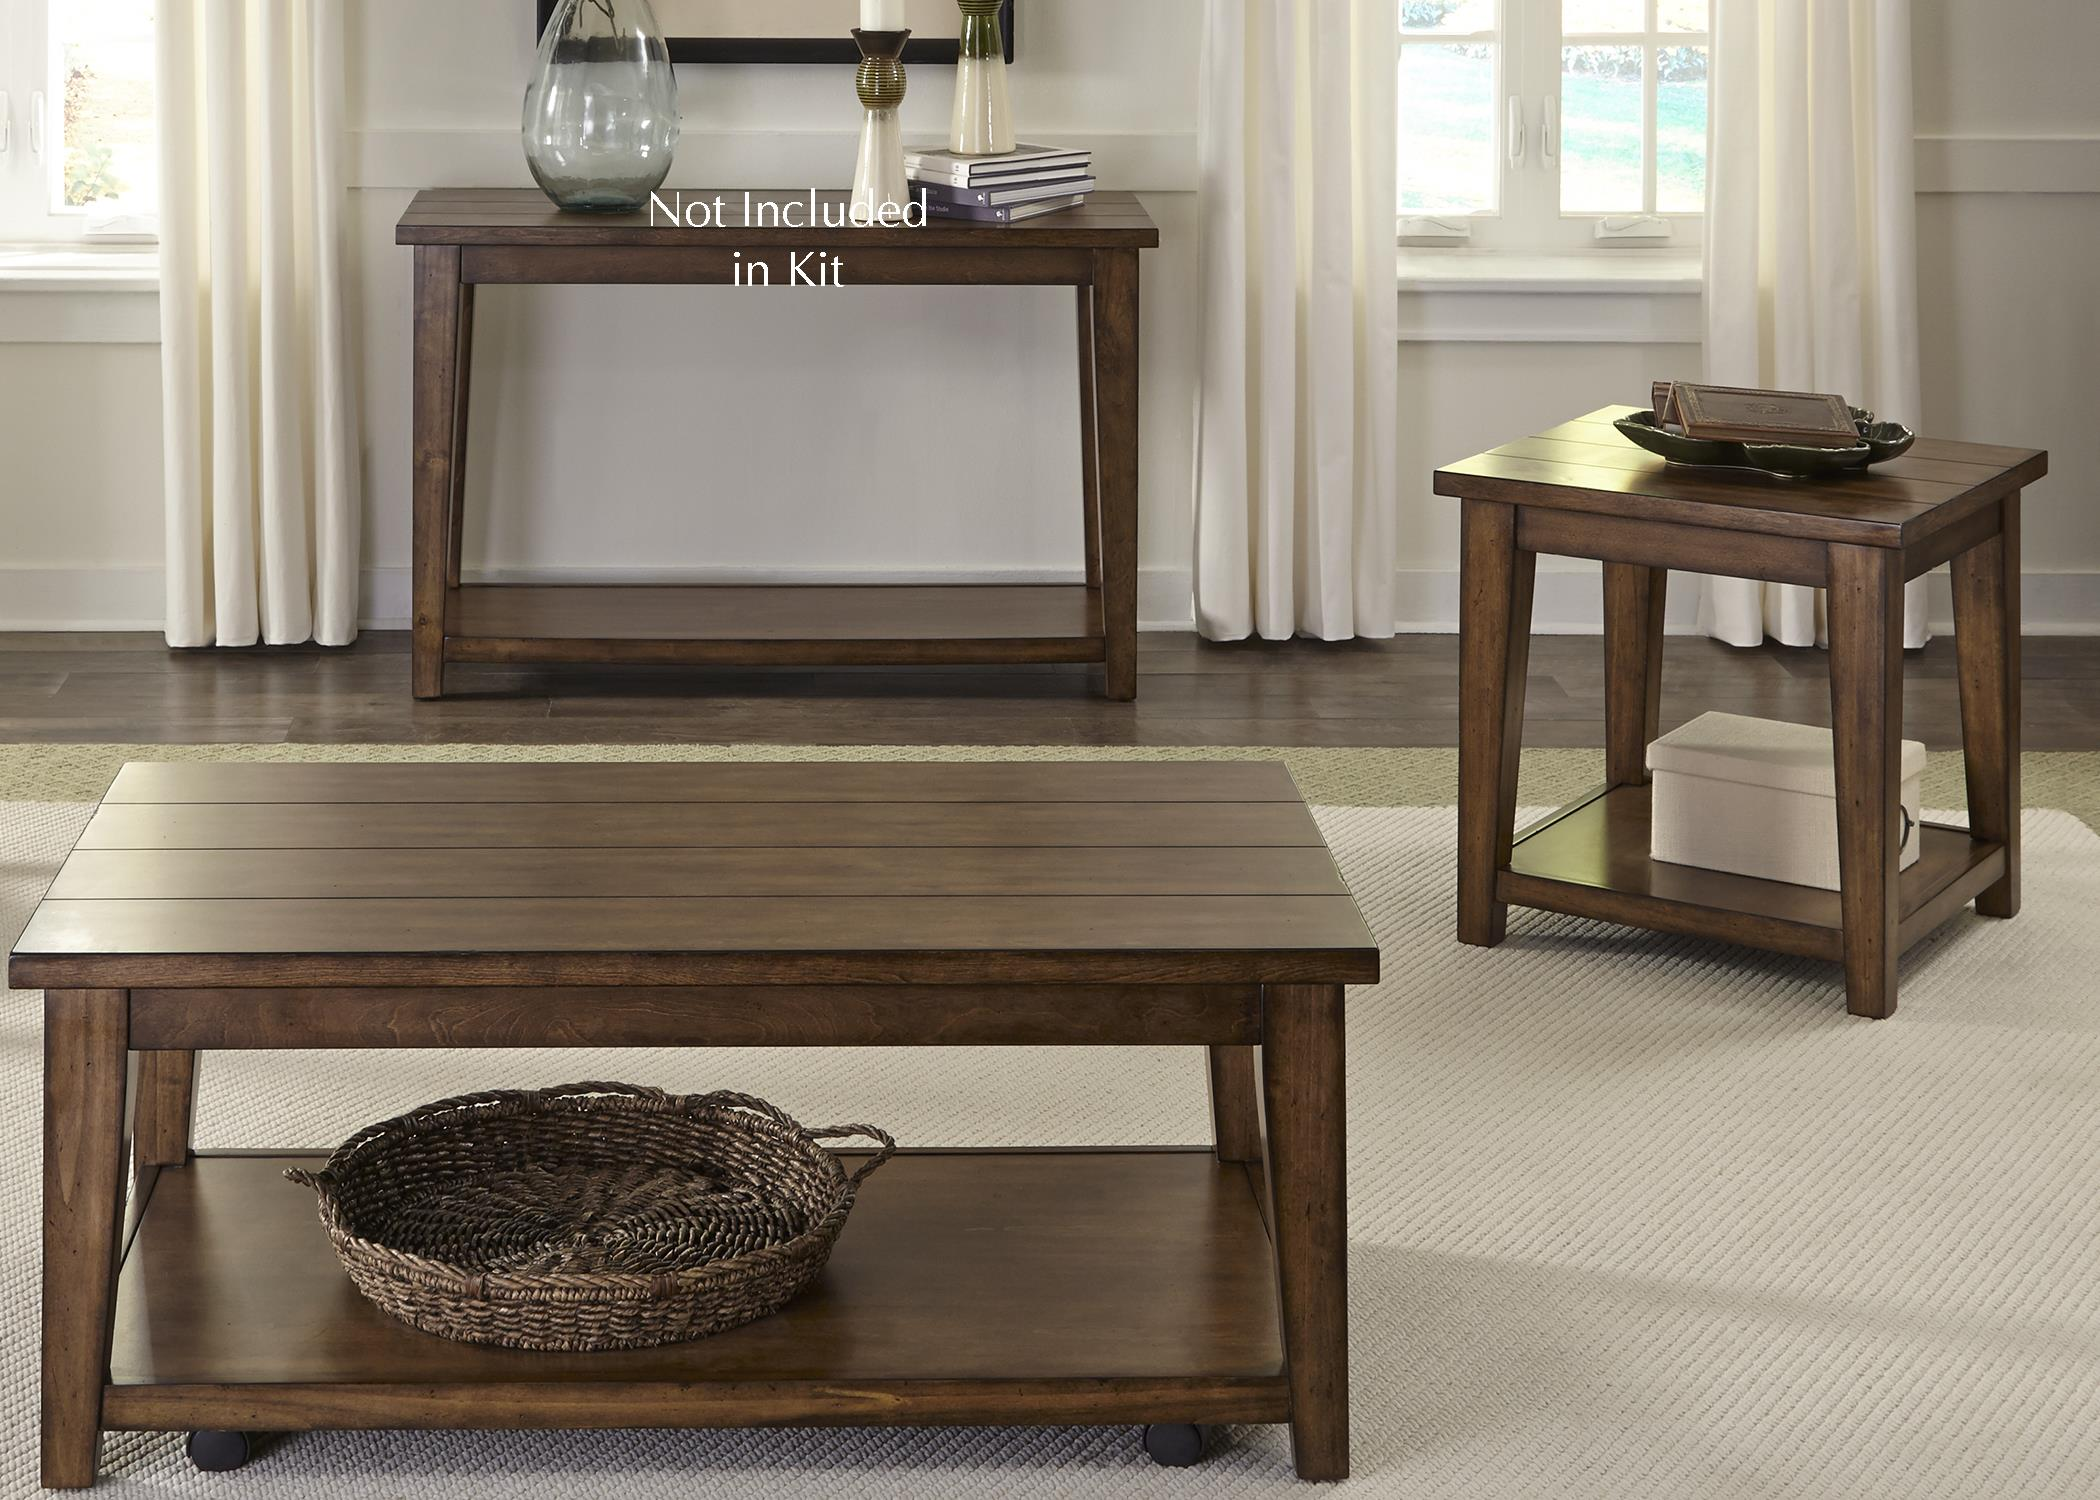 Liberty Furniture Lancaster 3 Piece Set  - Item Number: 712-OT-3PCS